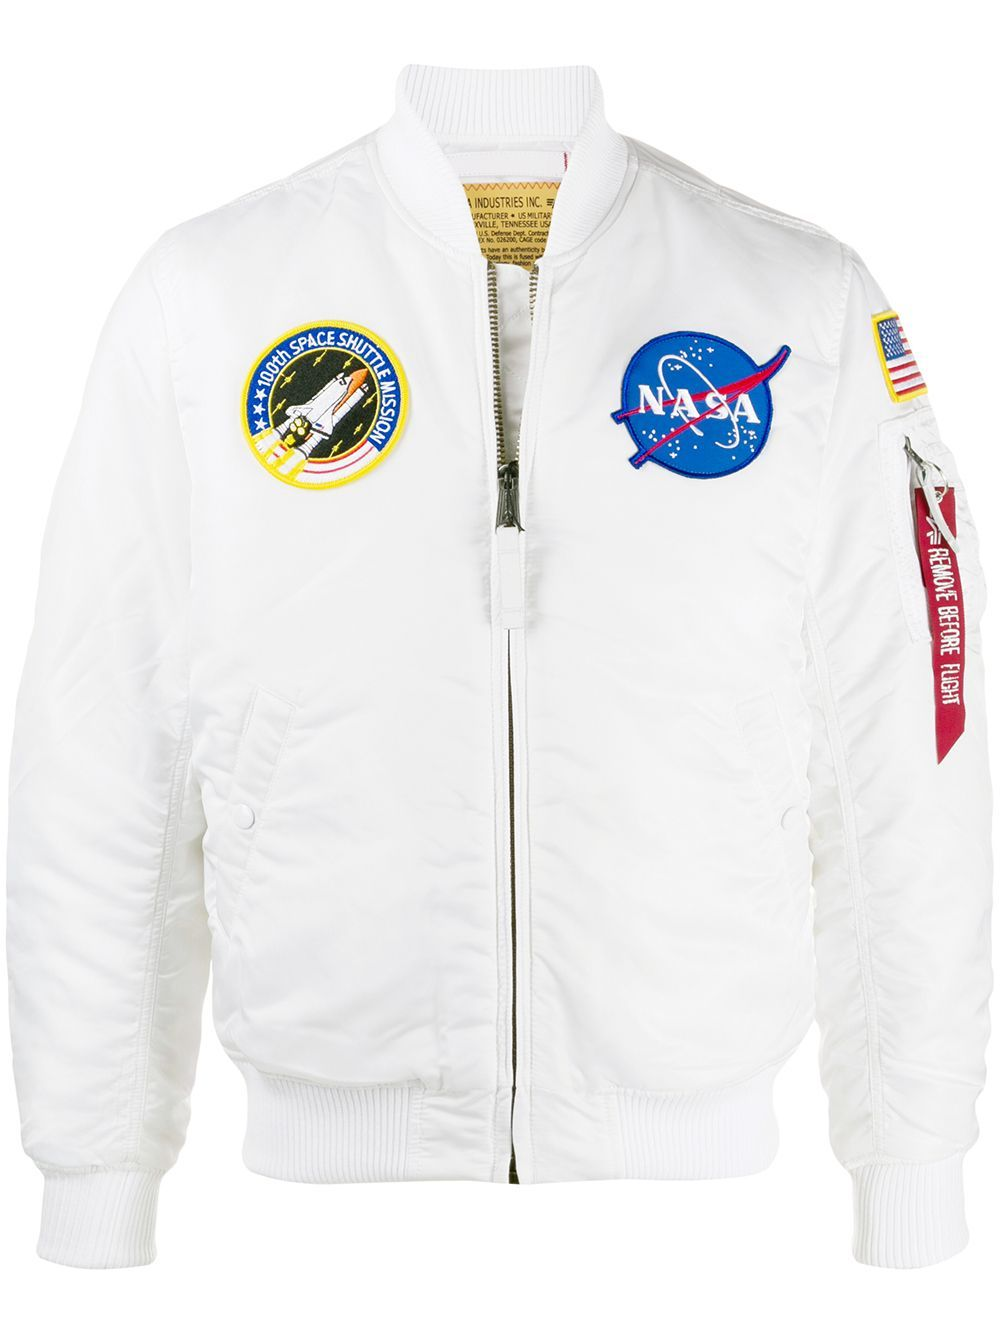 Unisex Bomber Jacket Space  Sphere White